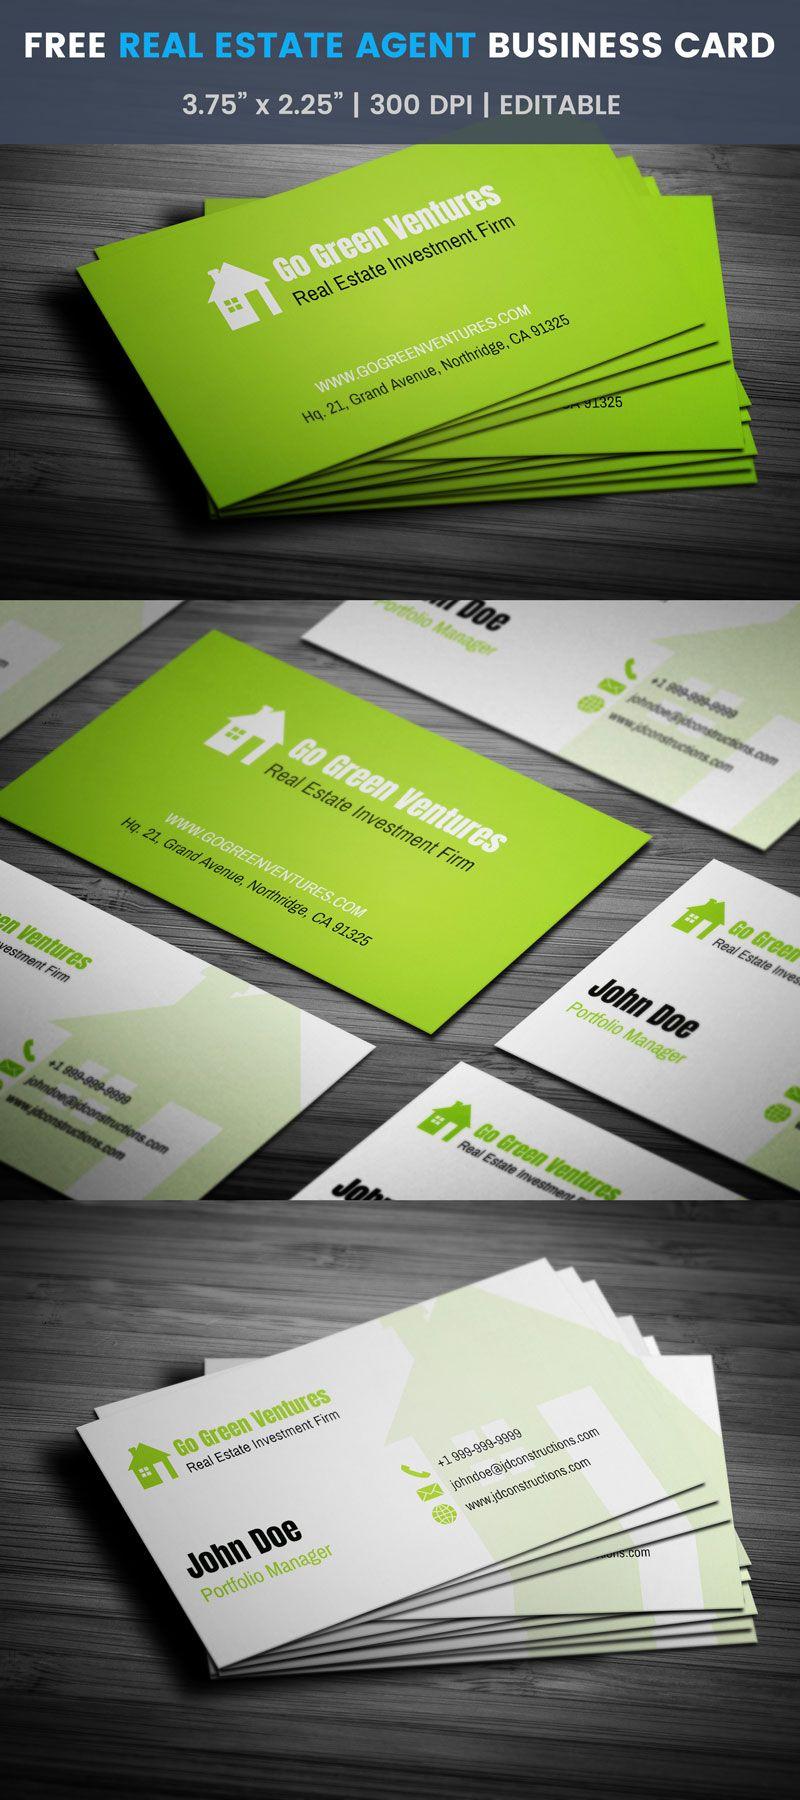 Real Estate Investor Business Cards : estate, investor, business, cards, Estate, Agent, Business, Preview, Templates,, Investors,, Cards